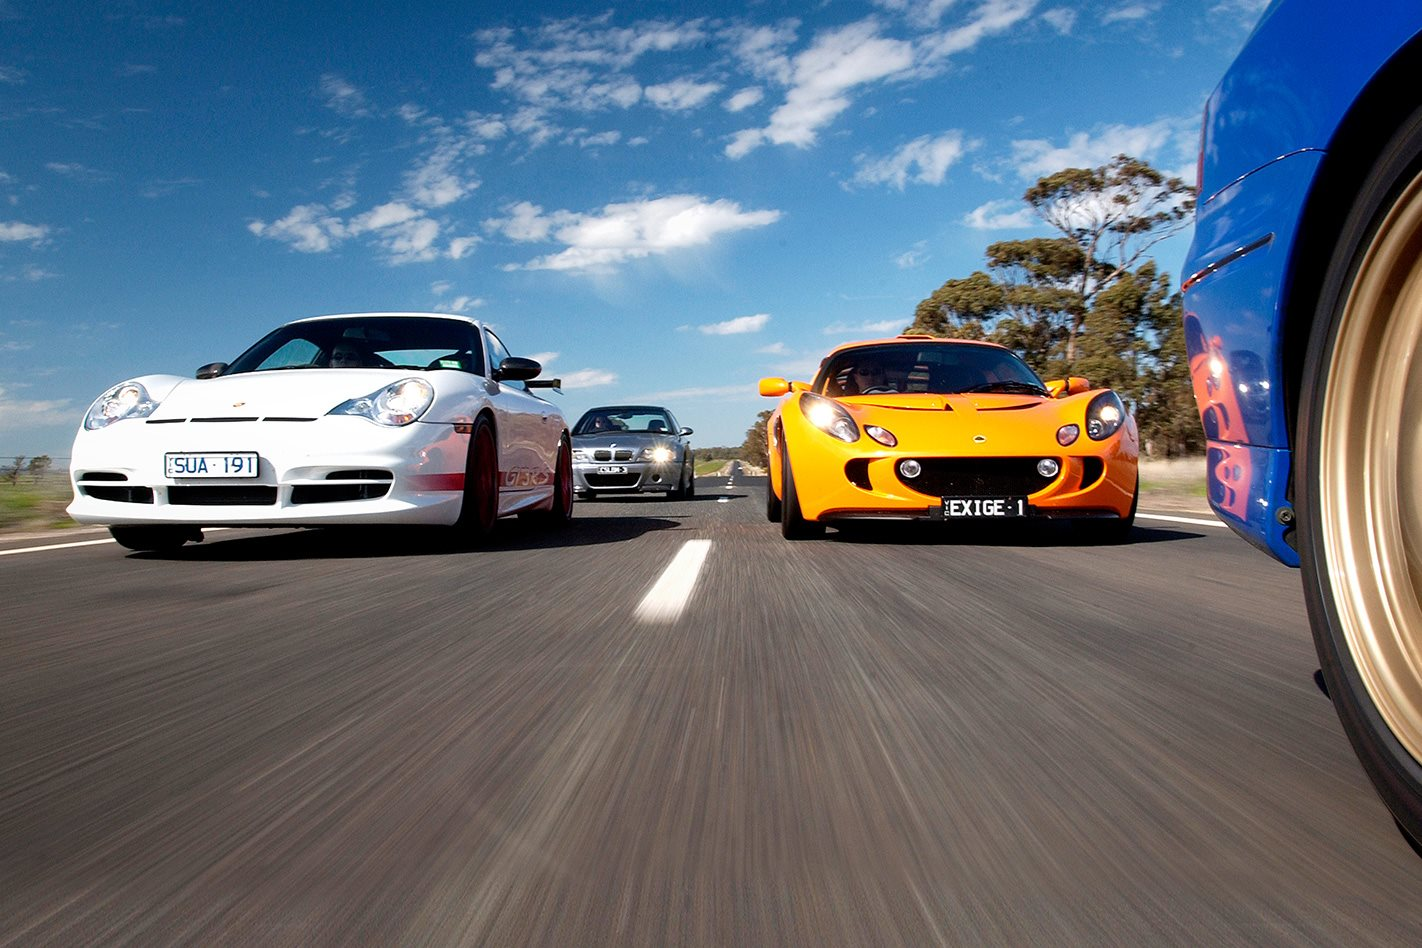 Porsche GT3 RS & Lotus Exige front